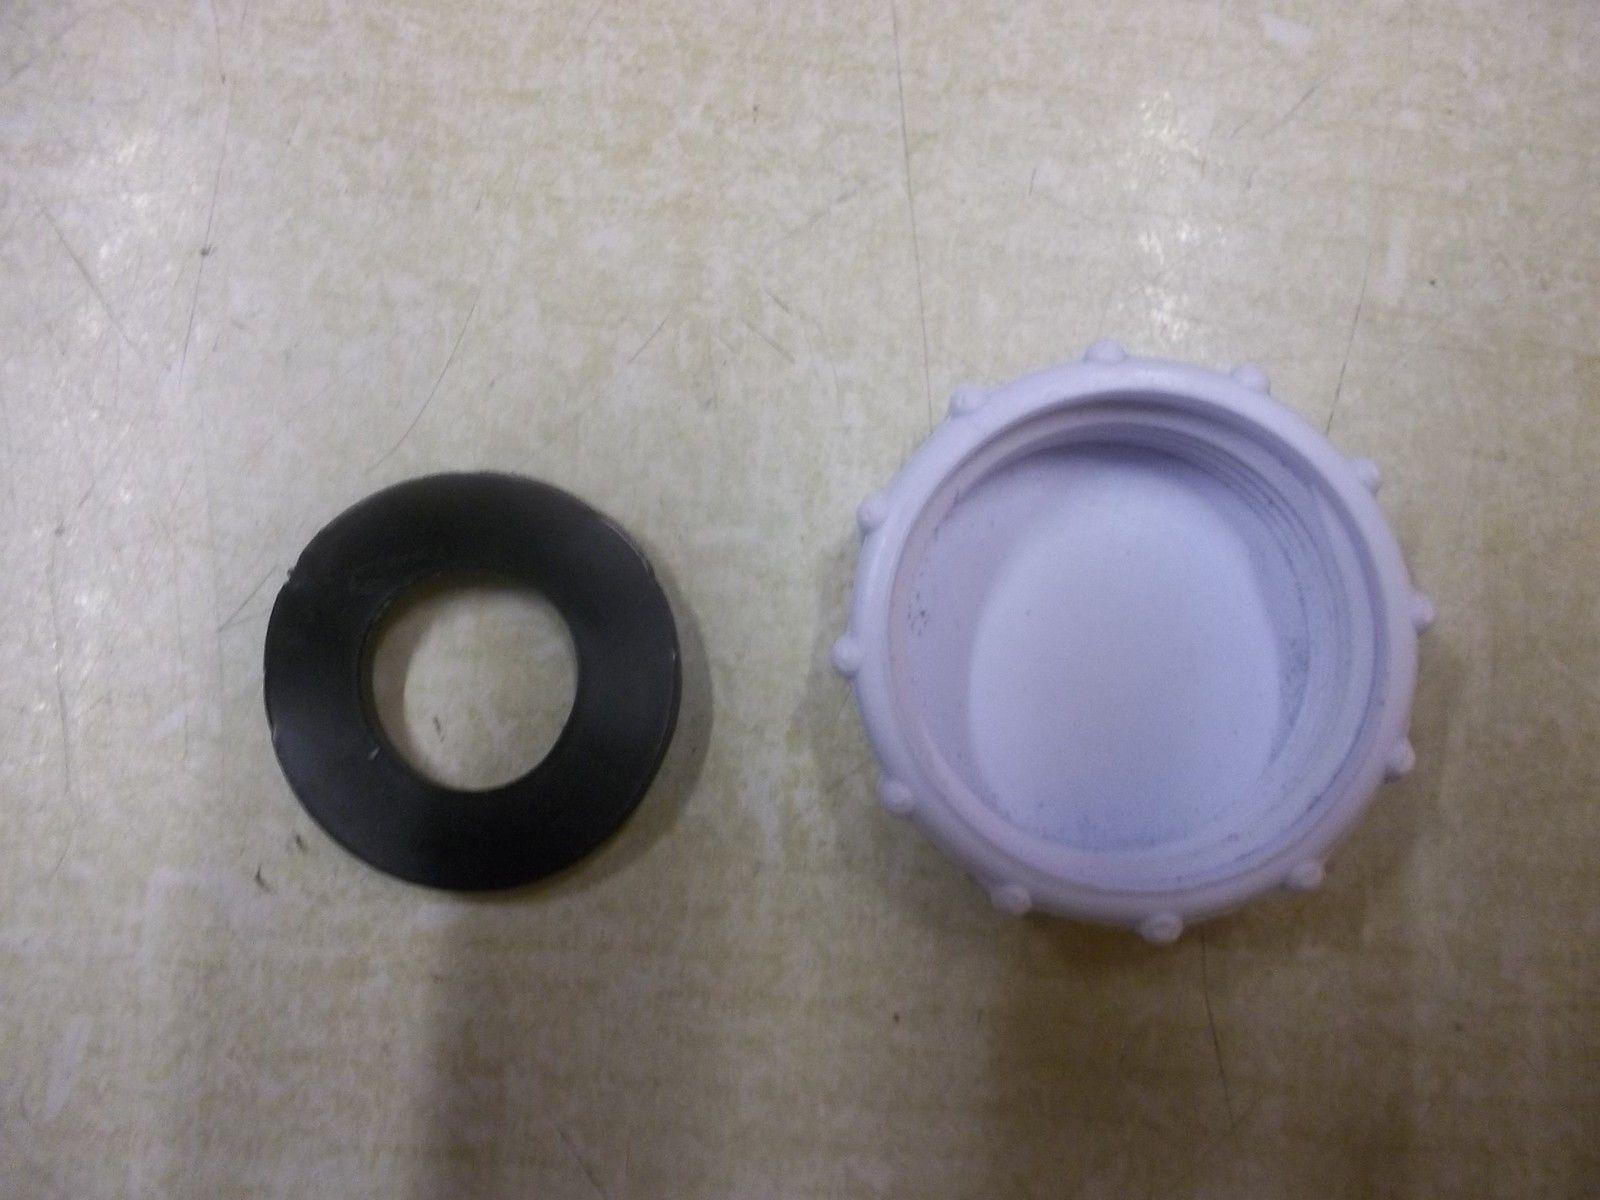 Buy 1 Quot Cap Stop End For Washing Machine Dishwasher Sink